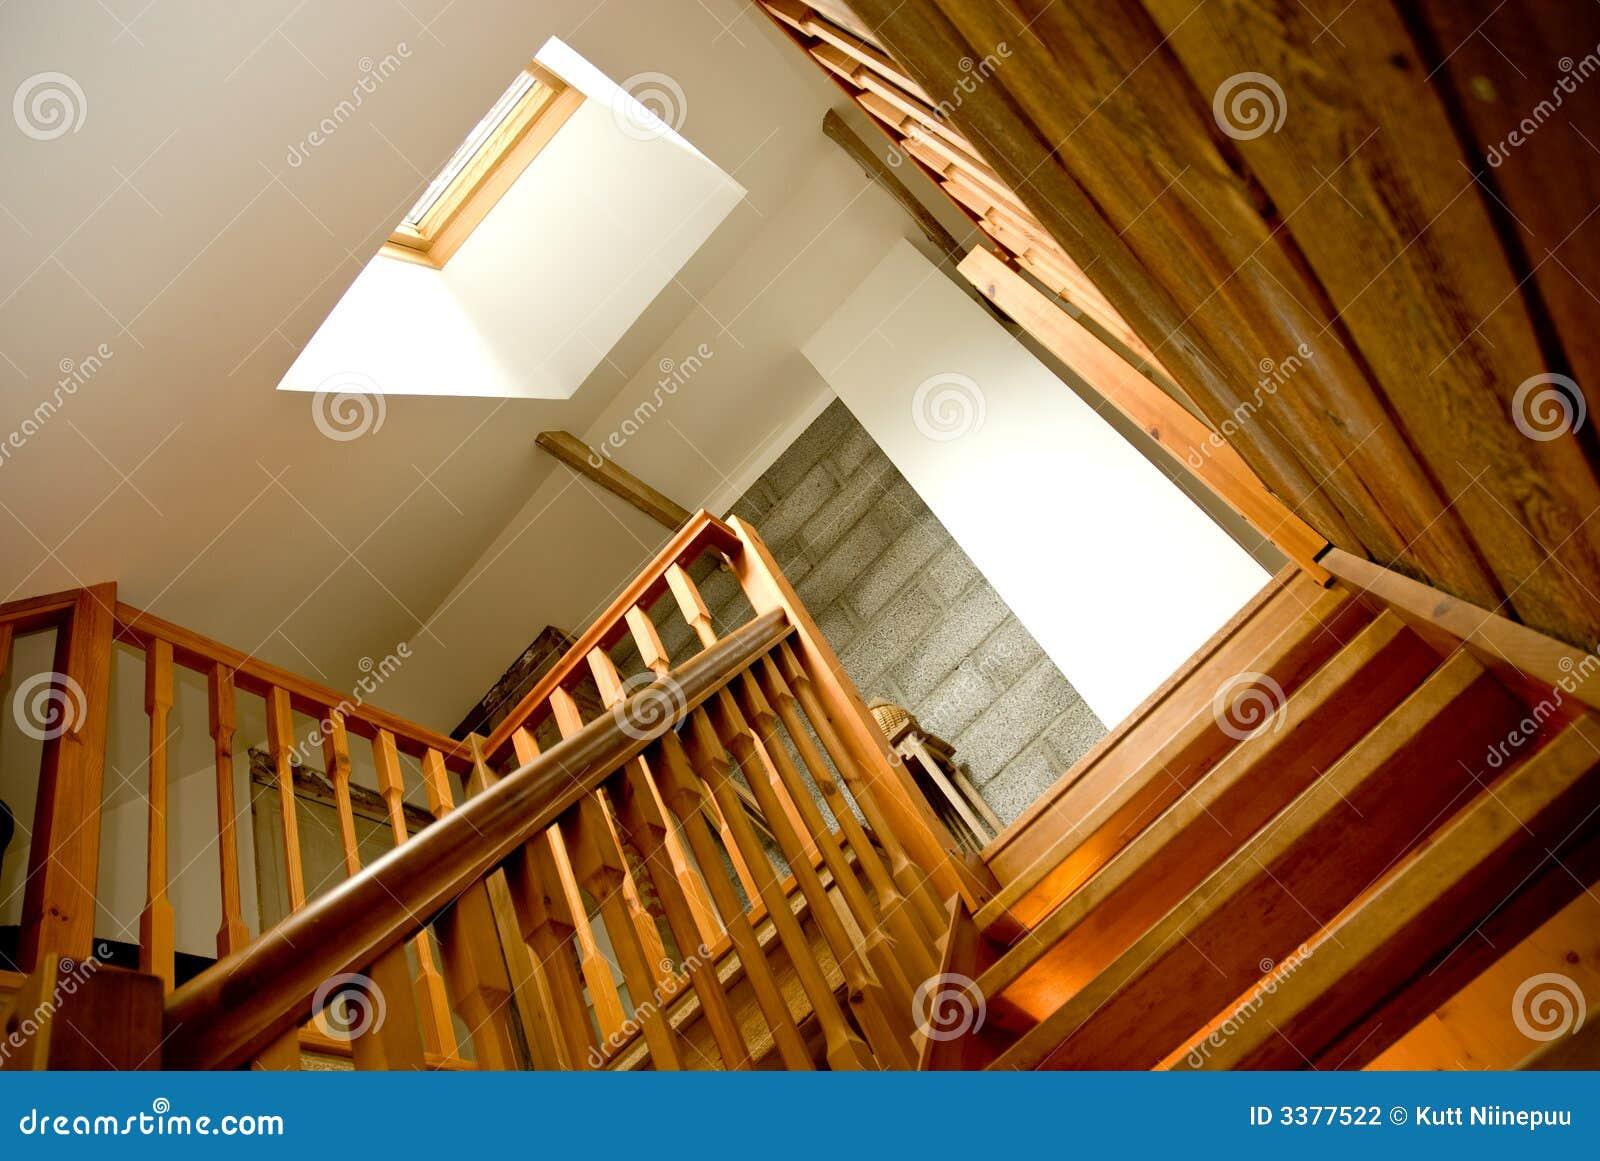 Escalera de madera de interior fotograf a de archivo for Escaleras de interior fotos